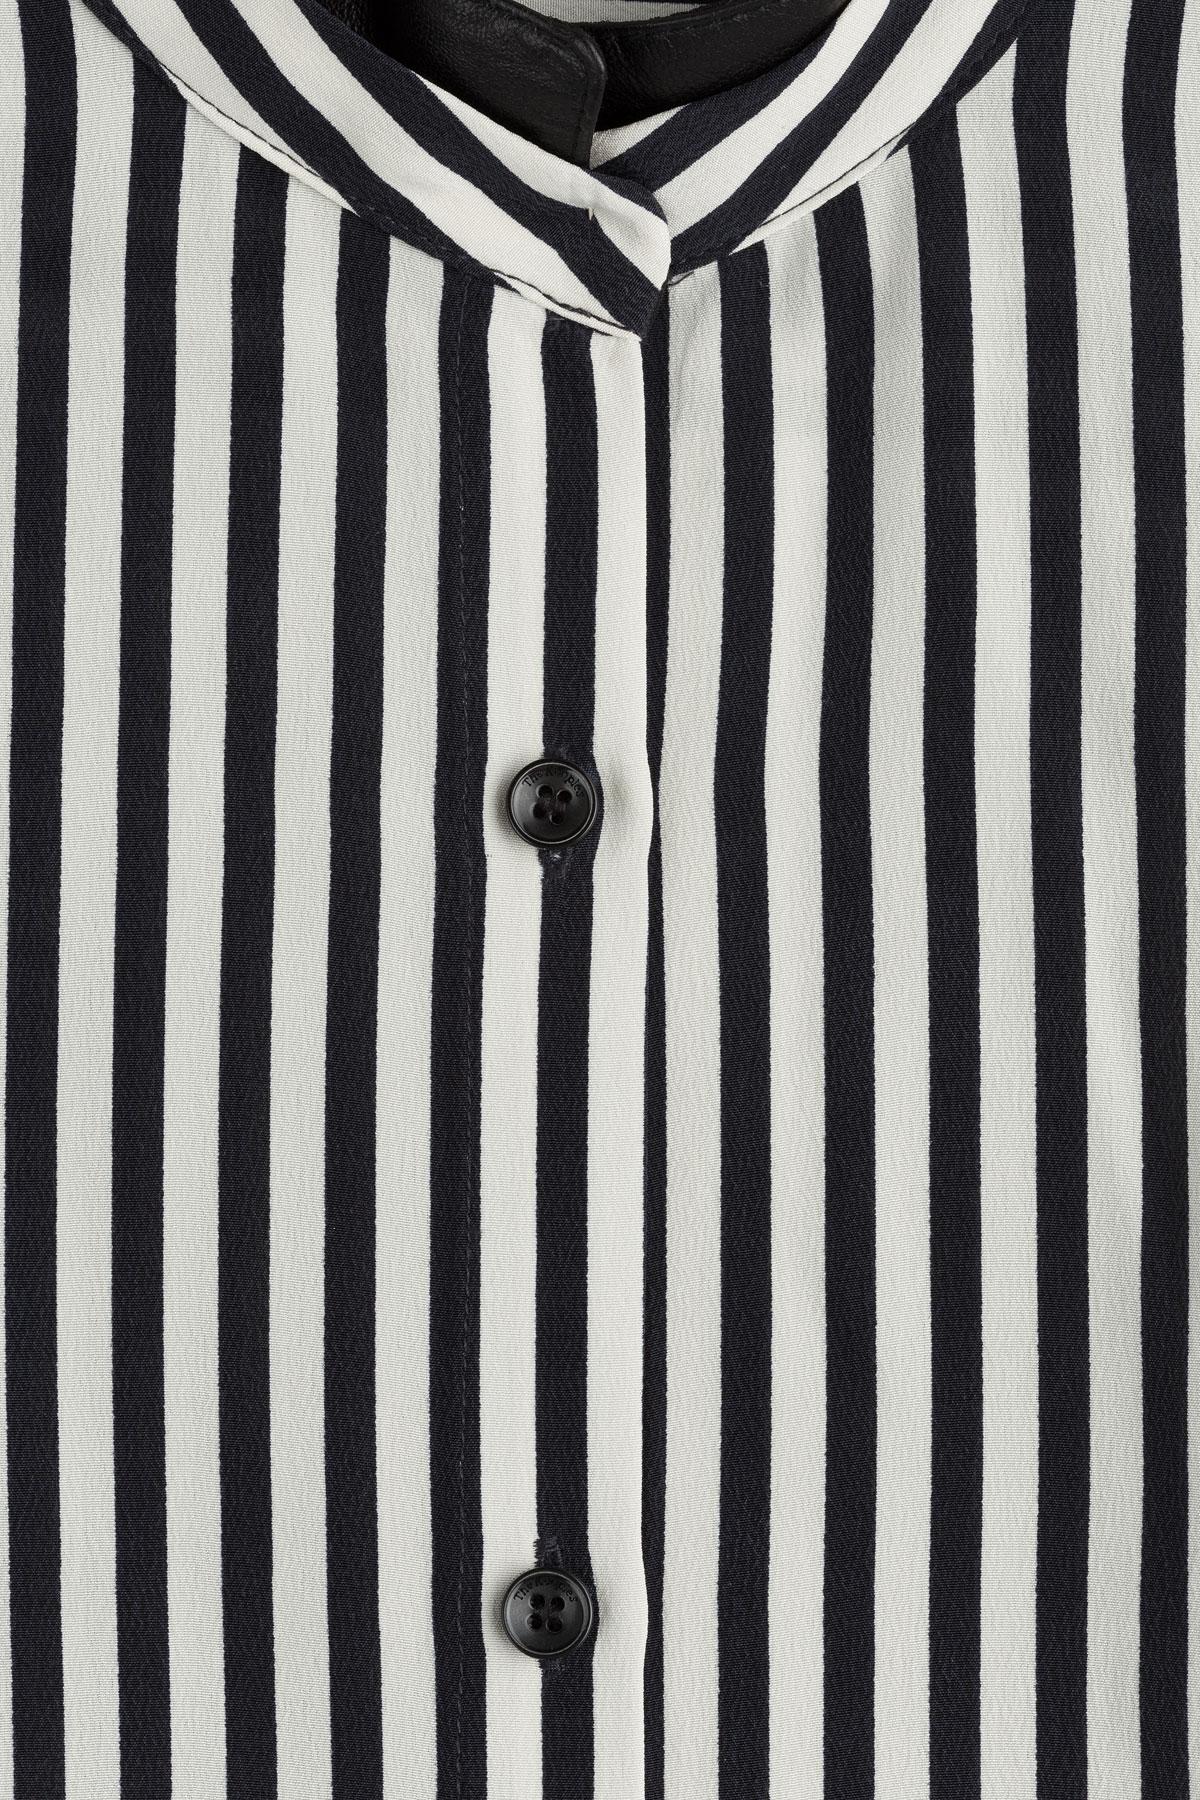 7f2c7a48300a7 Black And White Striped Silk Shirt